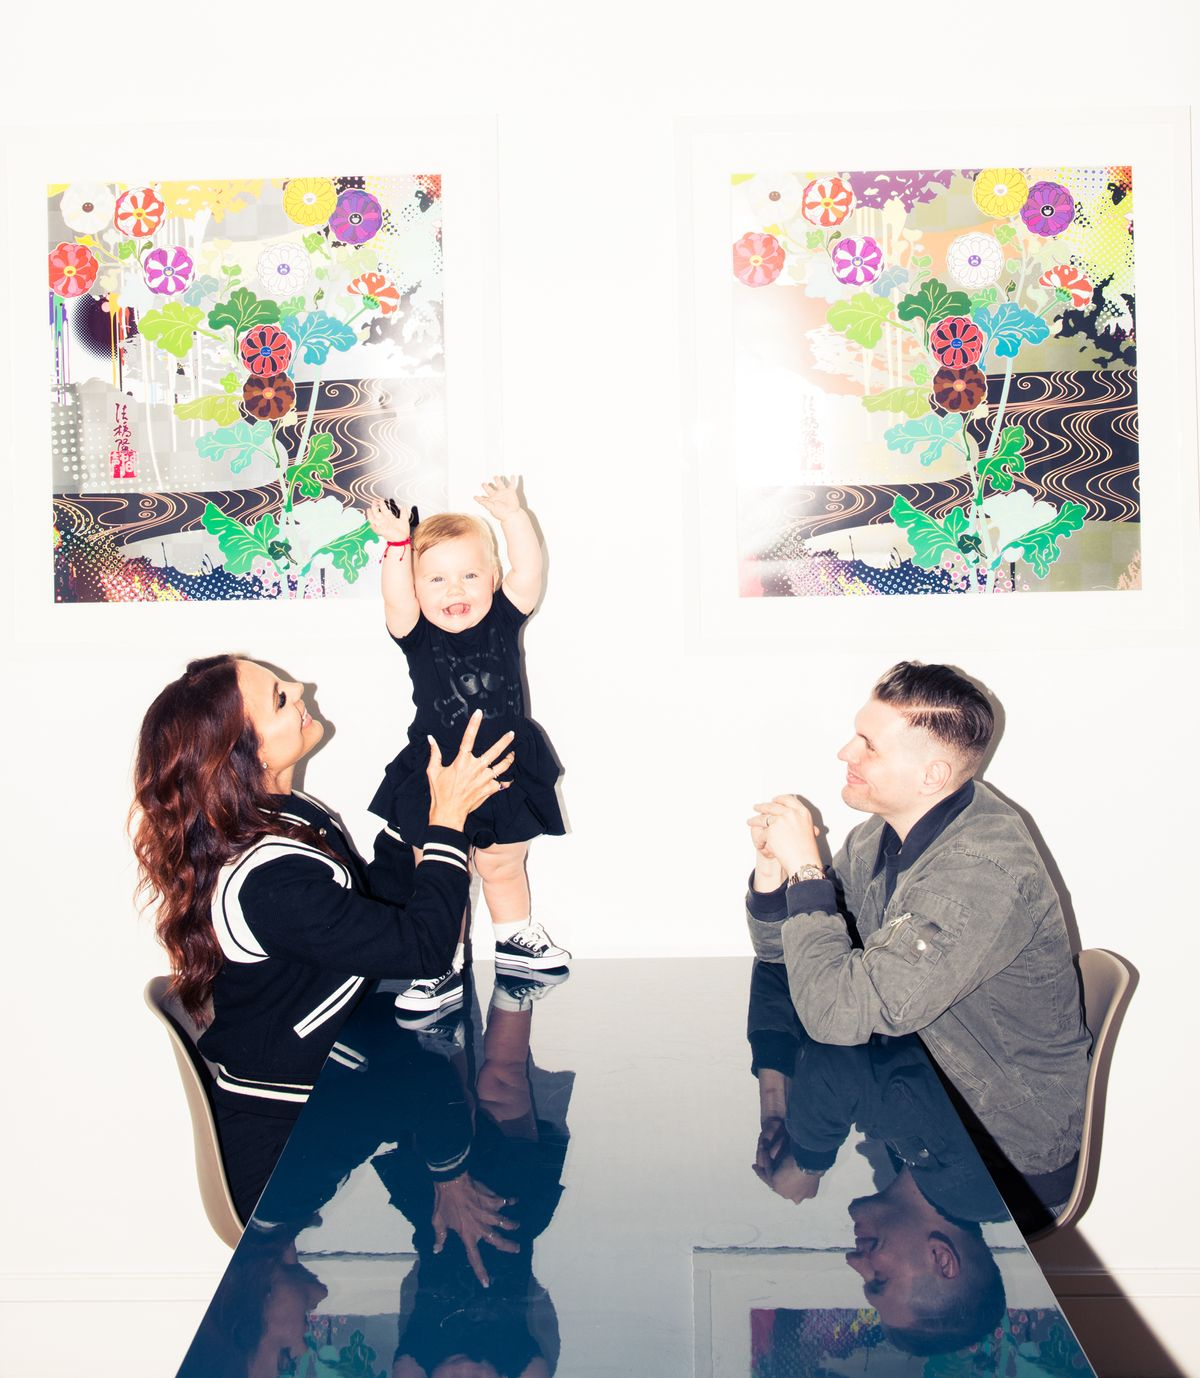 Noah Callahan-Bever & Deirdre Maloney